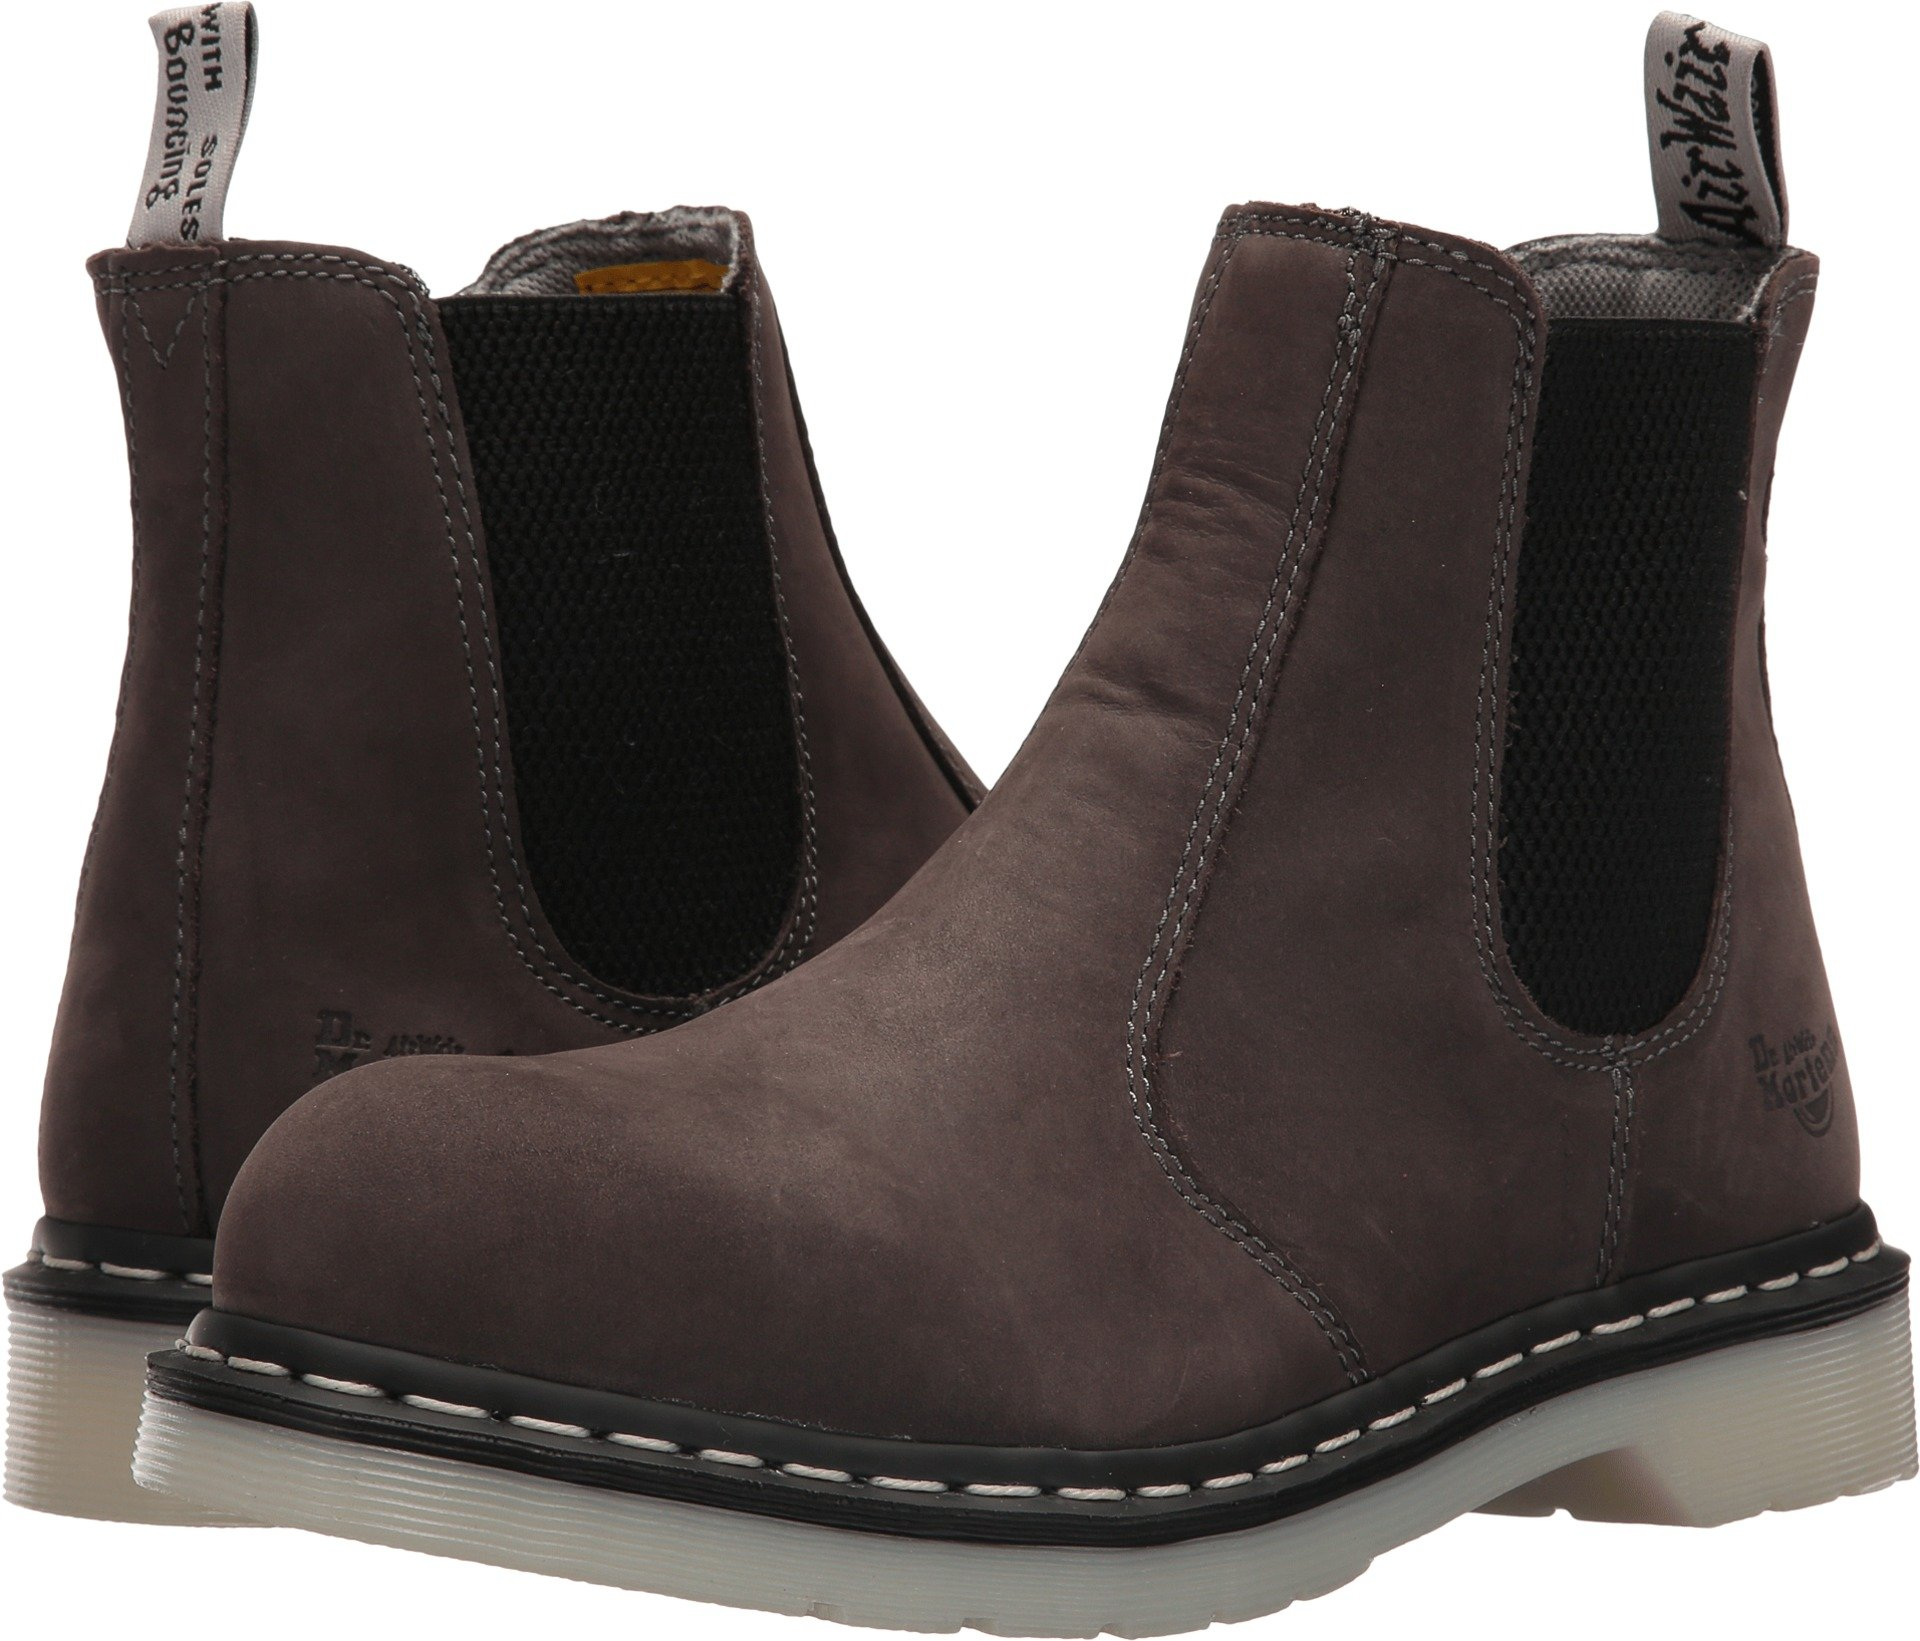 Dr. Martens Women's Arbor Chelsea Boots, Grey, 4 UK, 6 US by Dr. Martens